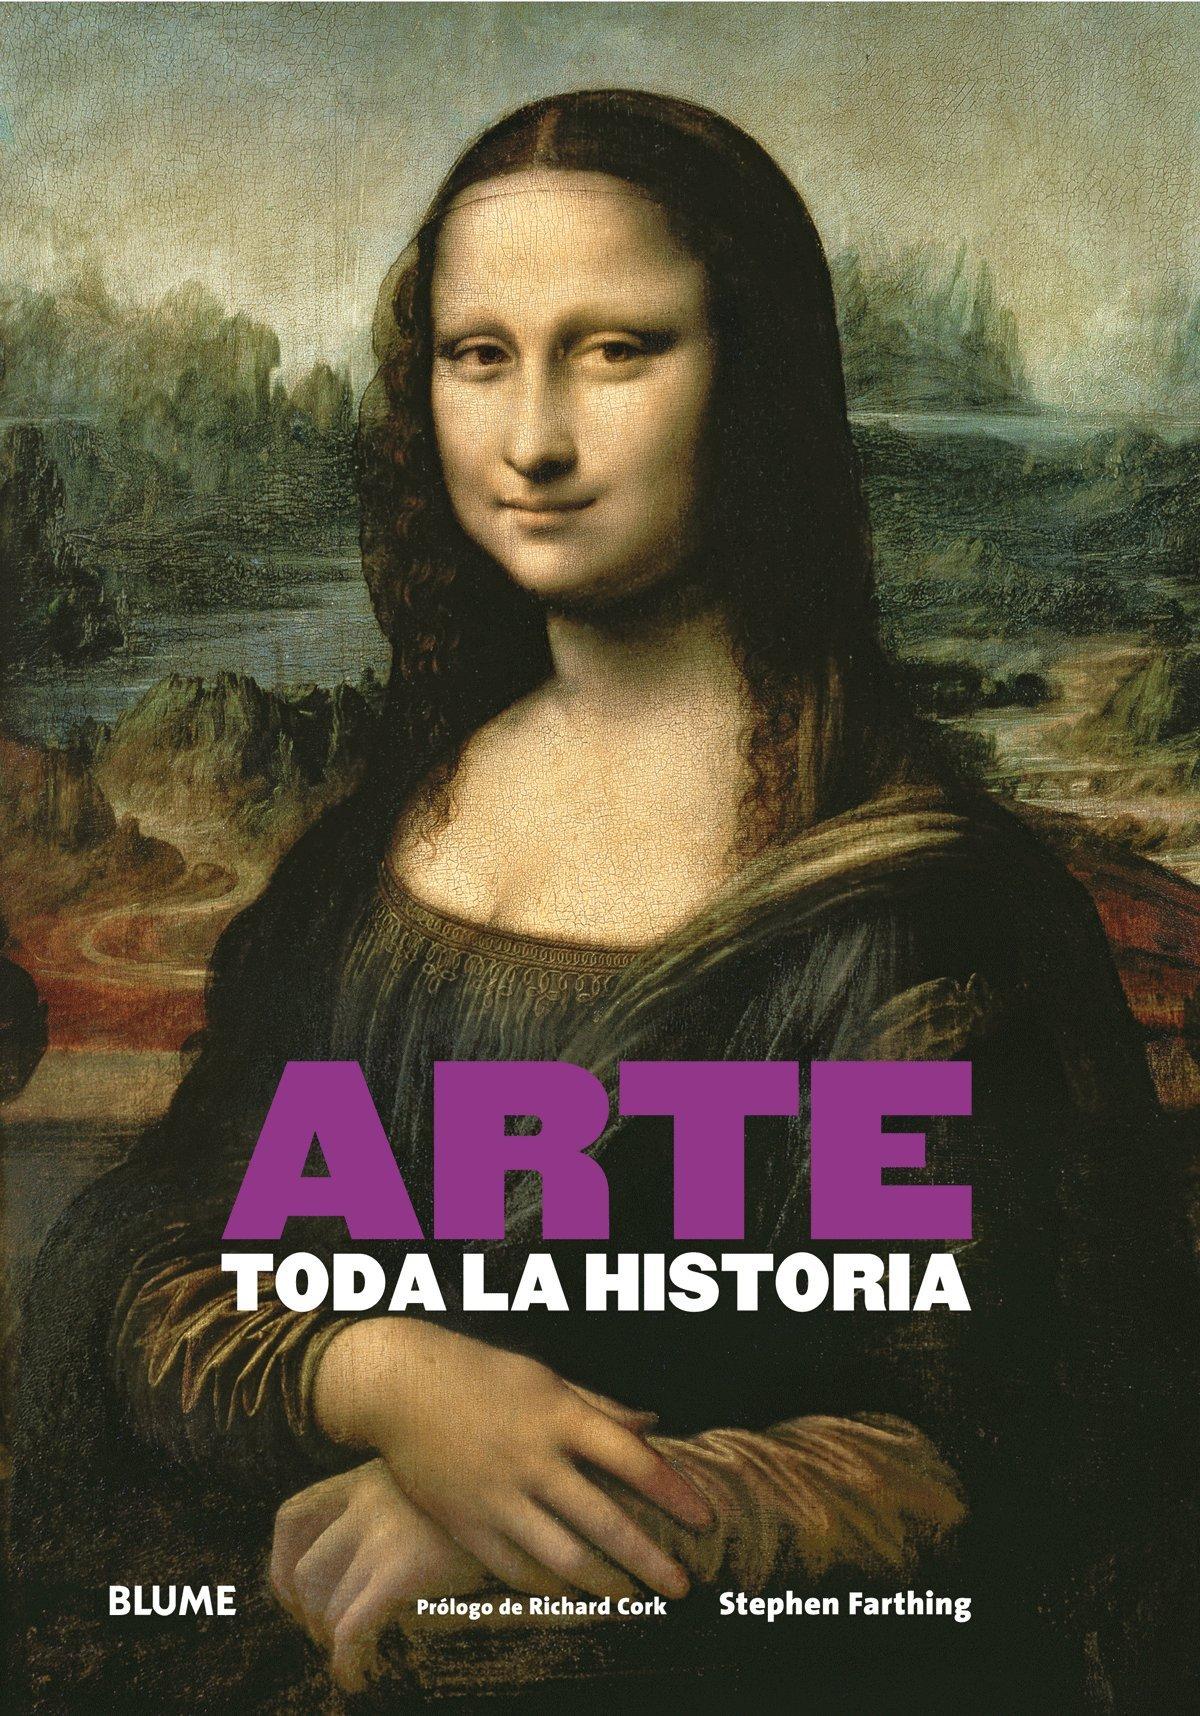 Arte. Toda La Historia: Amazon.es: Farthing, Stephen, Cork, Richard, Rodríguez Fischer, Cristina: Libros